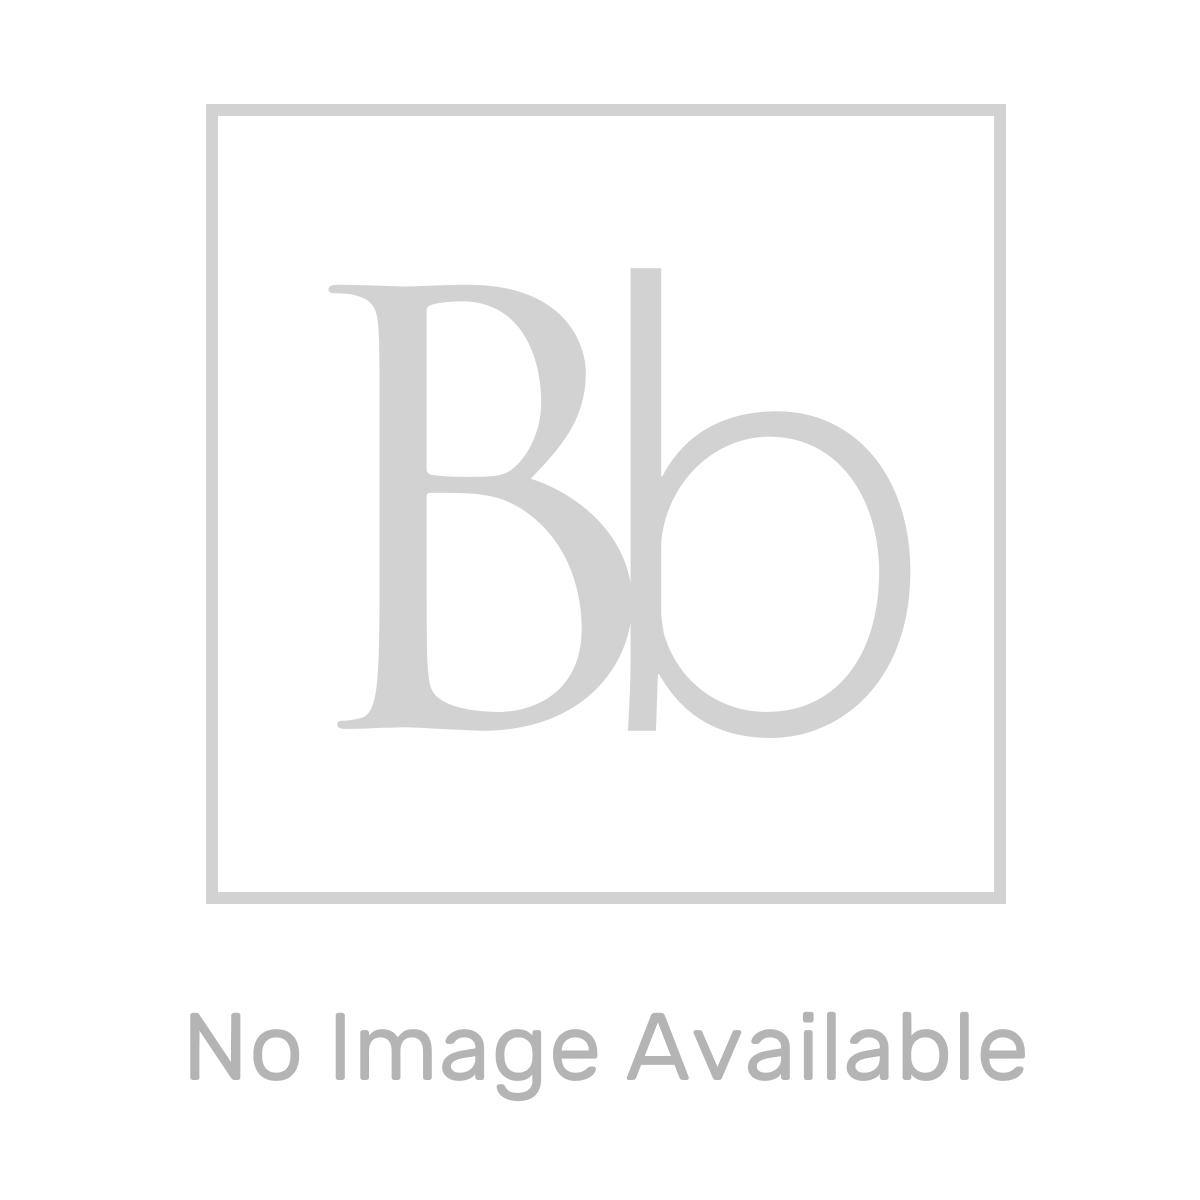 Croydex Trent Lockable Stainless Steel Bathroom Medicine Cabinet